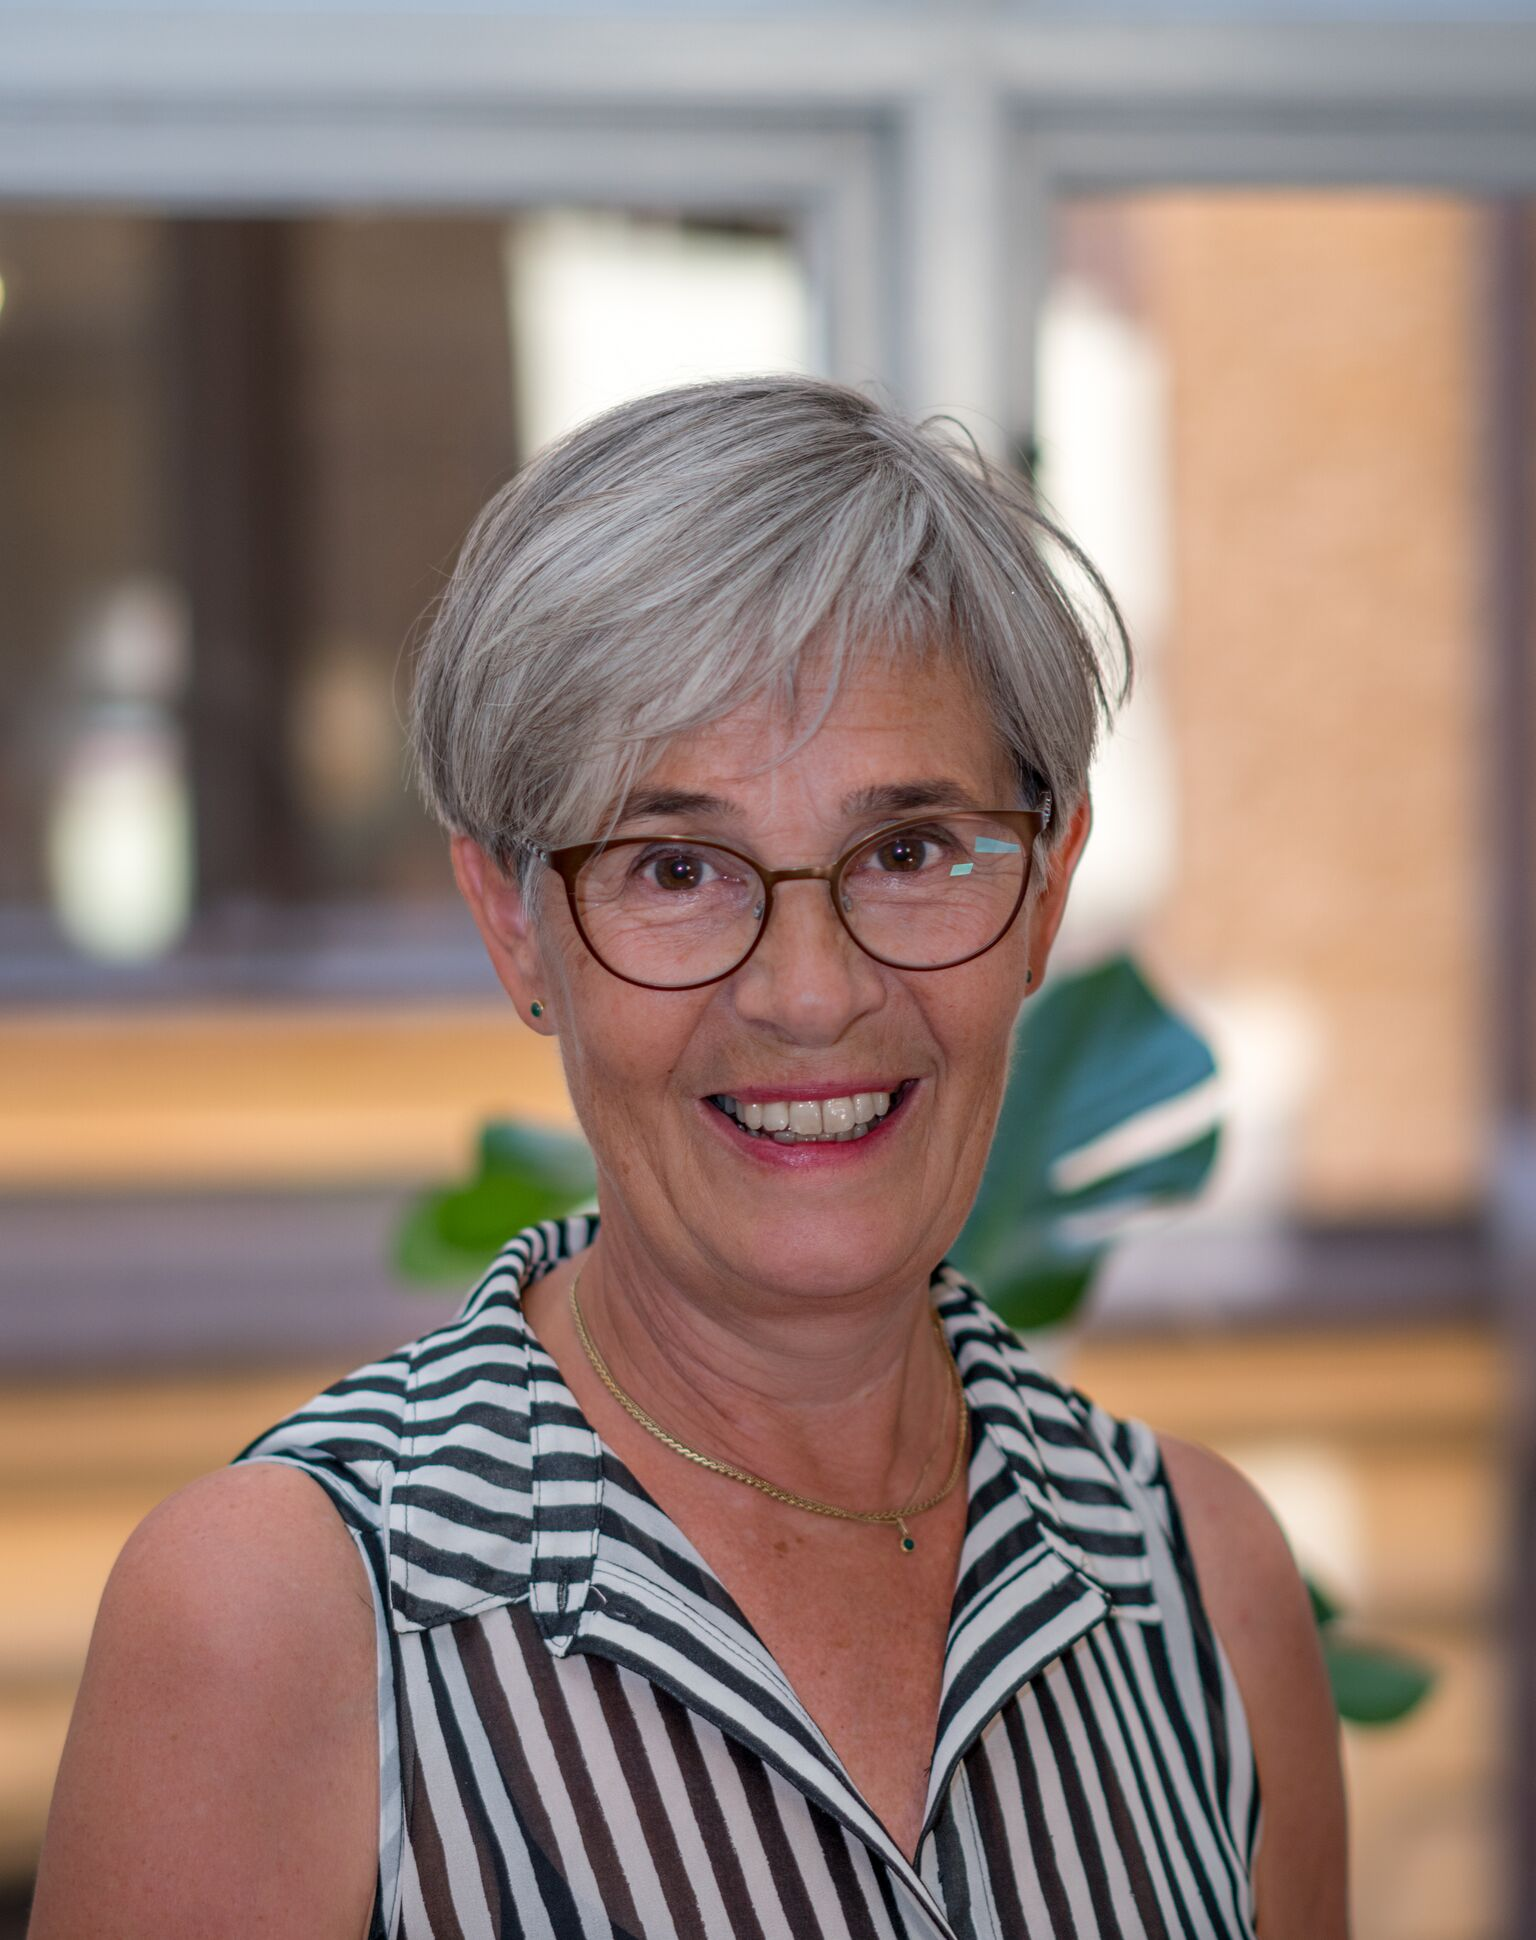 Anita Ranke